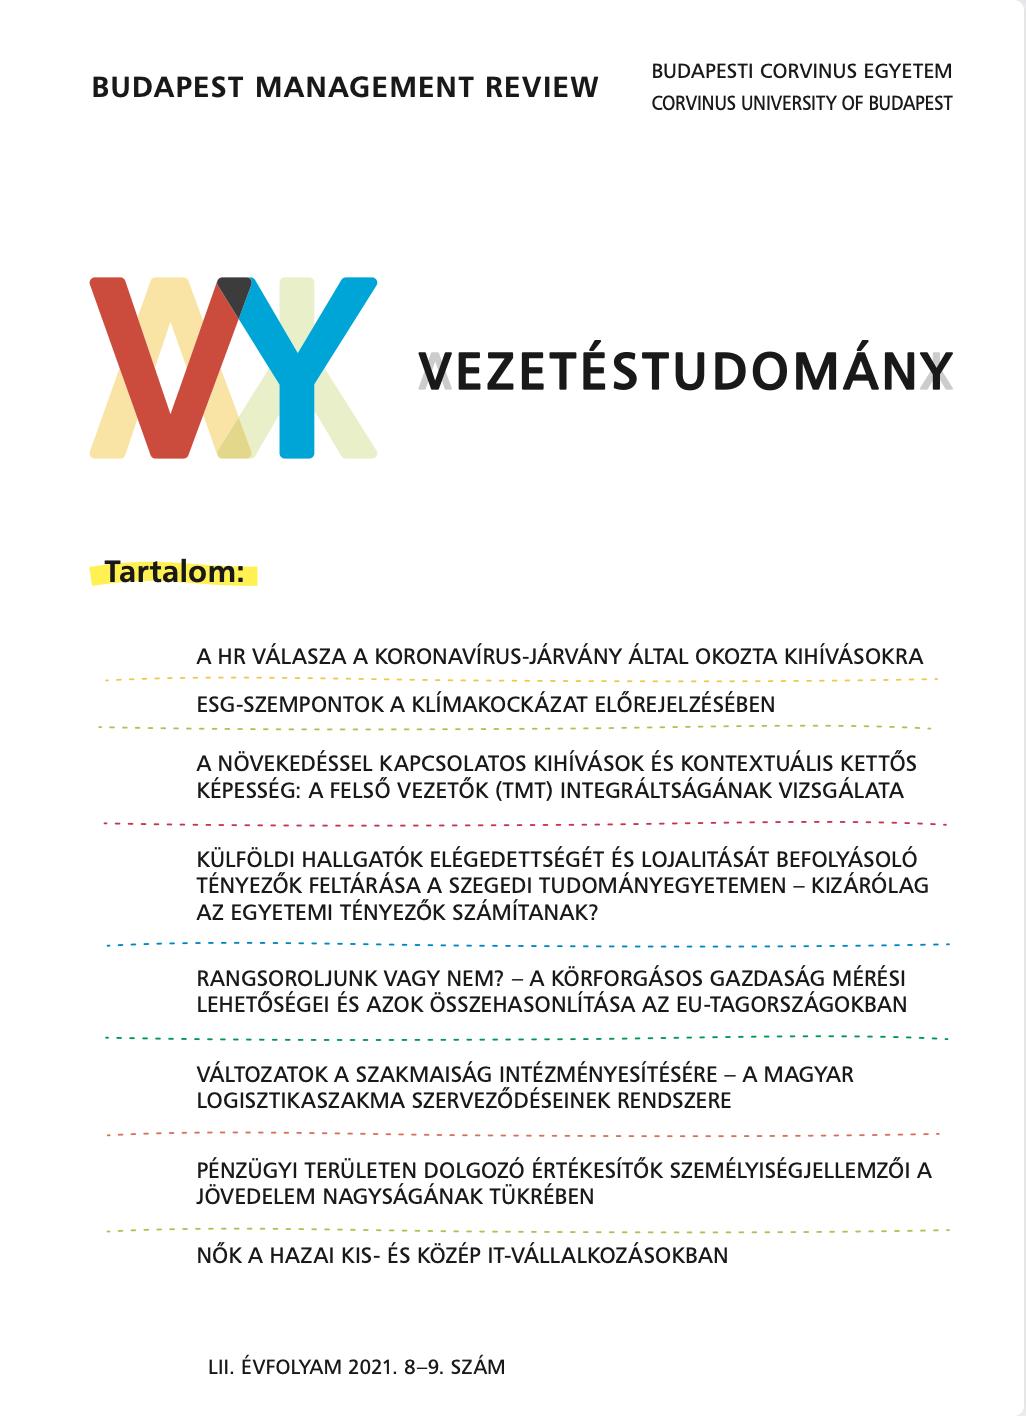 View Vol. 52 No. 8-9 (2021)